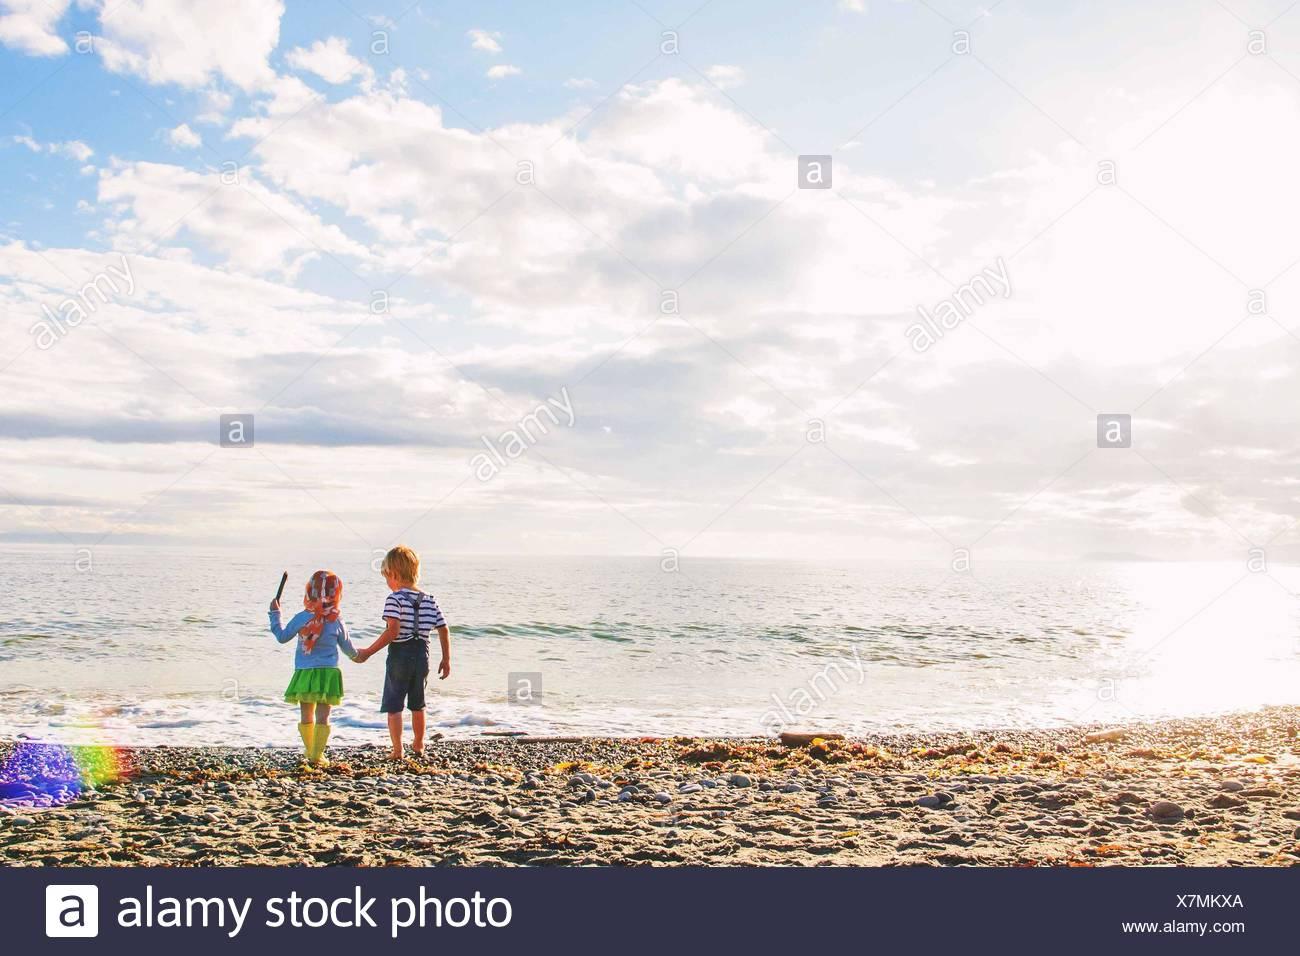 Boy (2-3) holding girl's (2-3) hand on beach - Stock Image